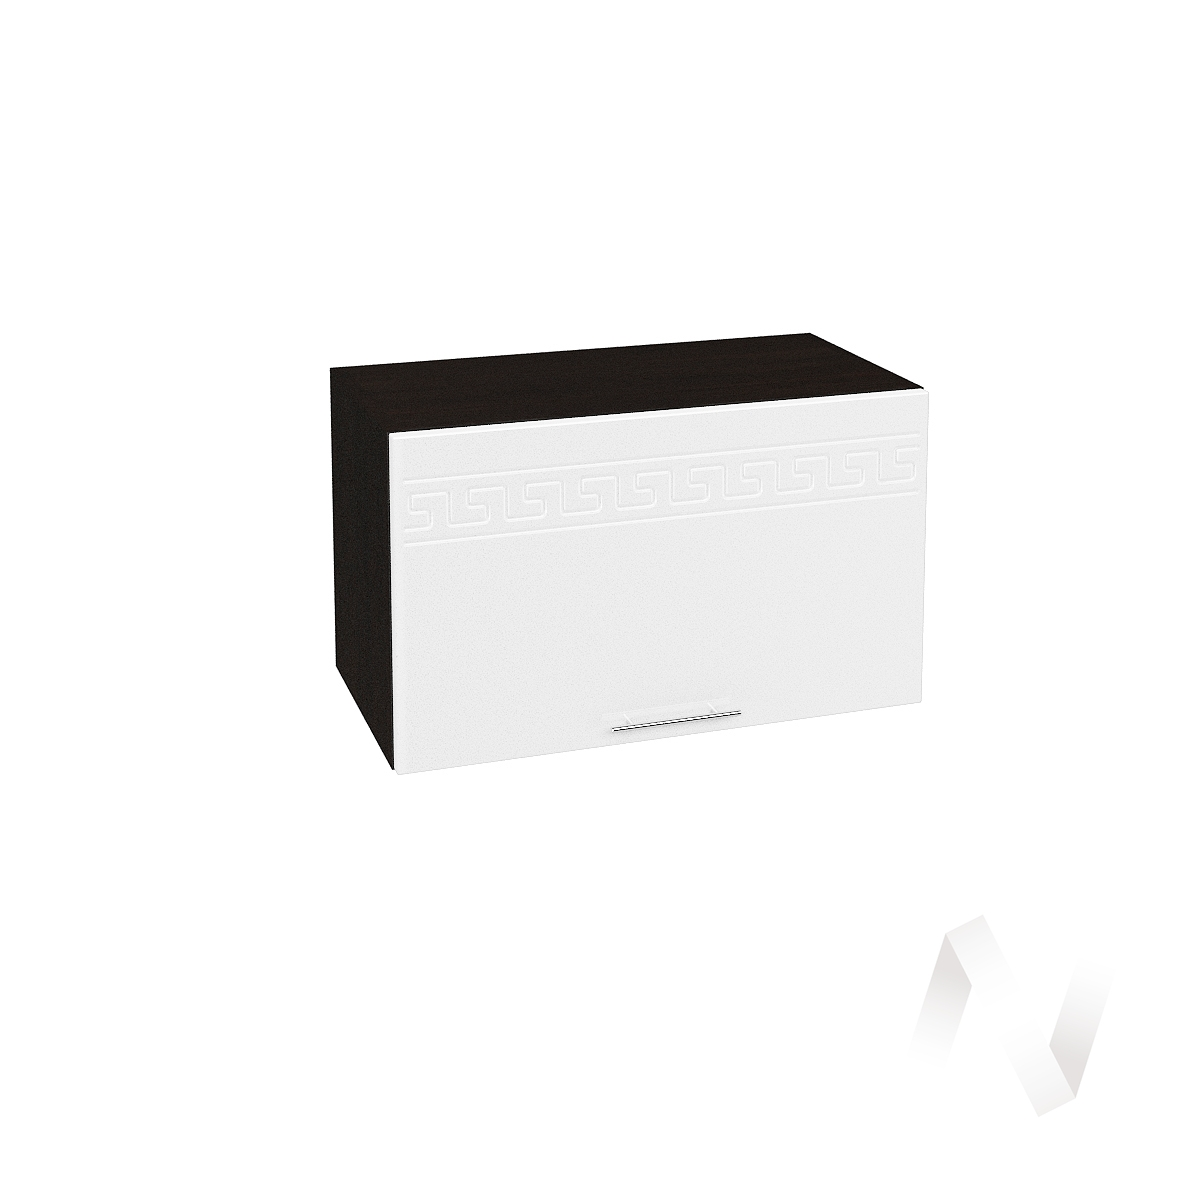 "Кухня ""Греция"": Шкаф верхний горизонтальный 600, ШВГ 600 (белый металлик/корпус венге)"